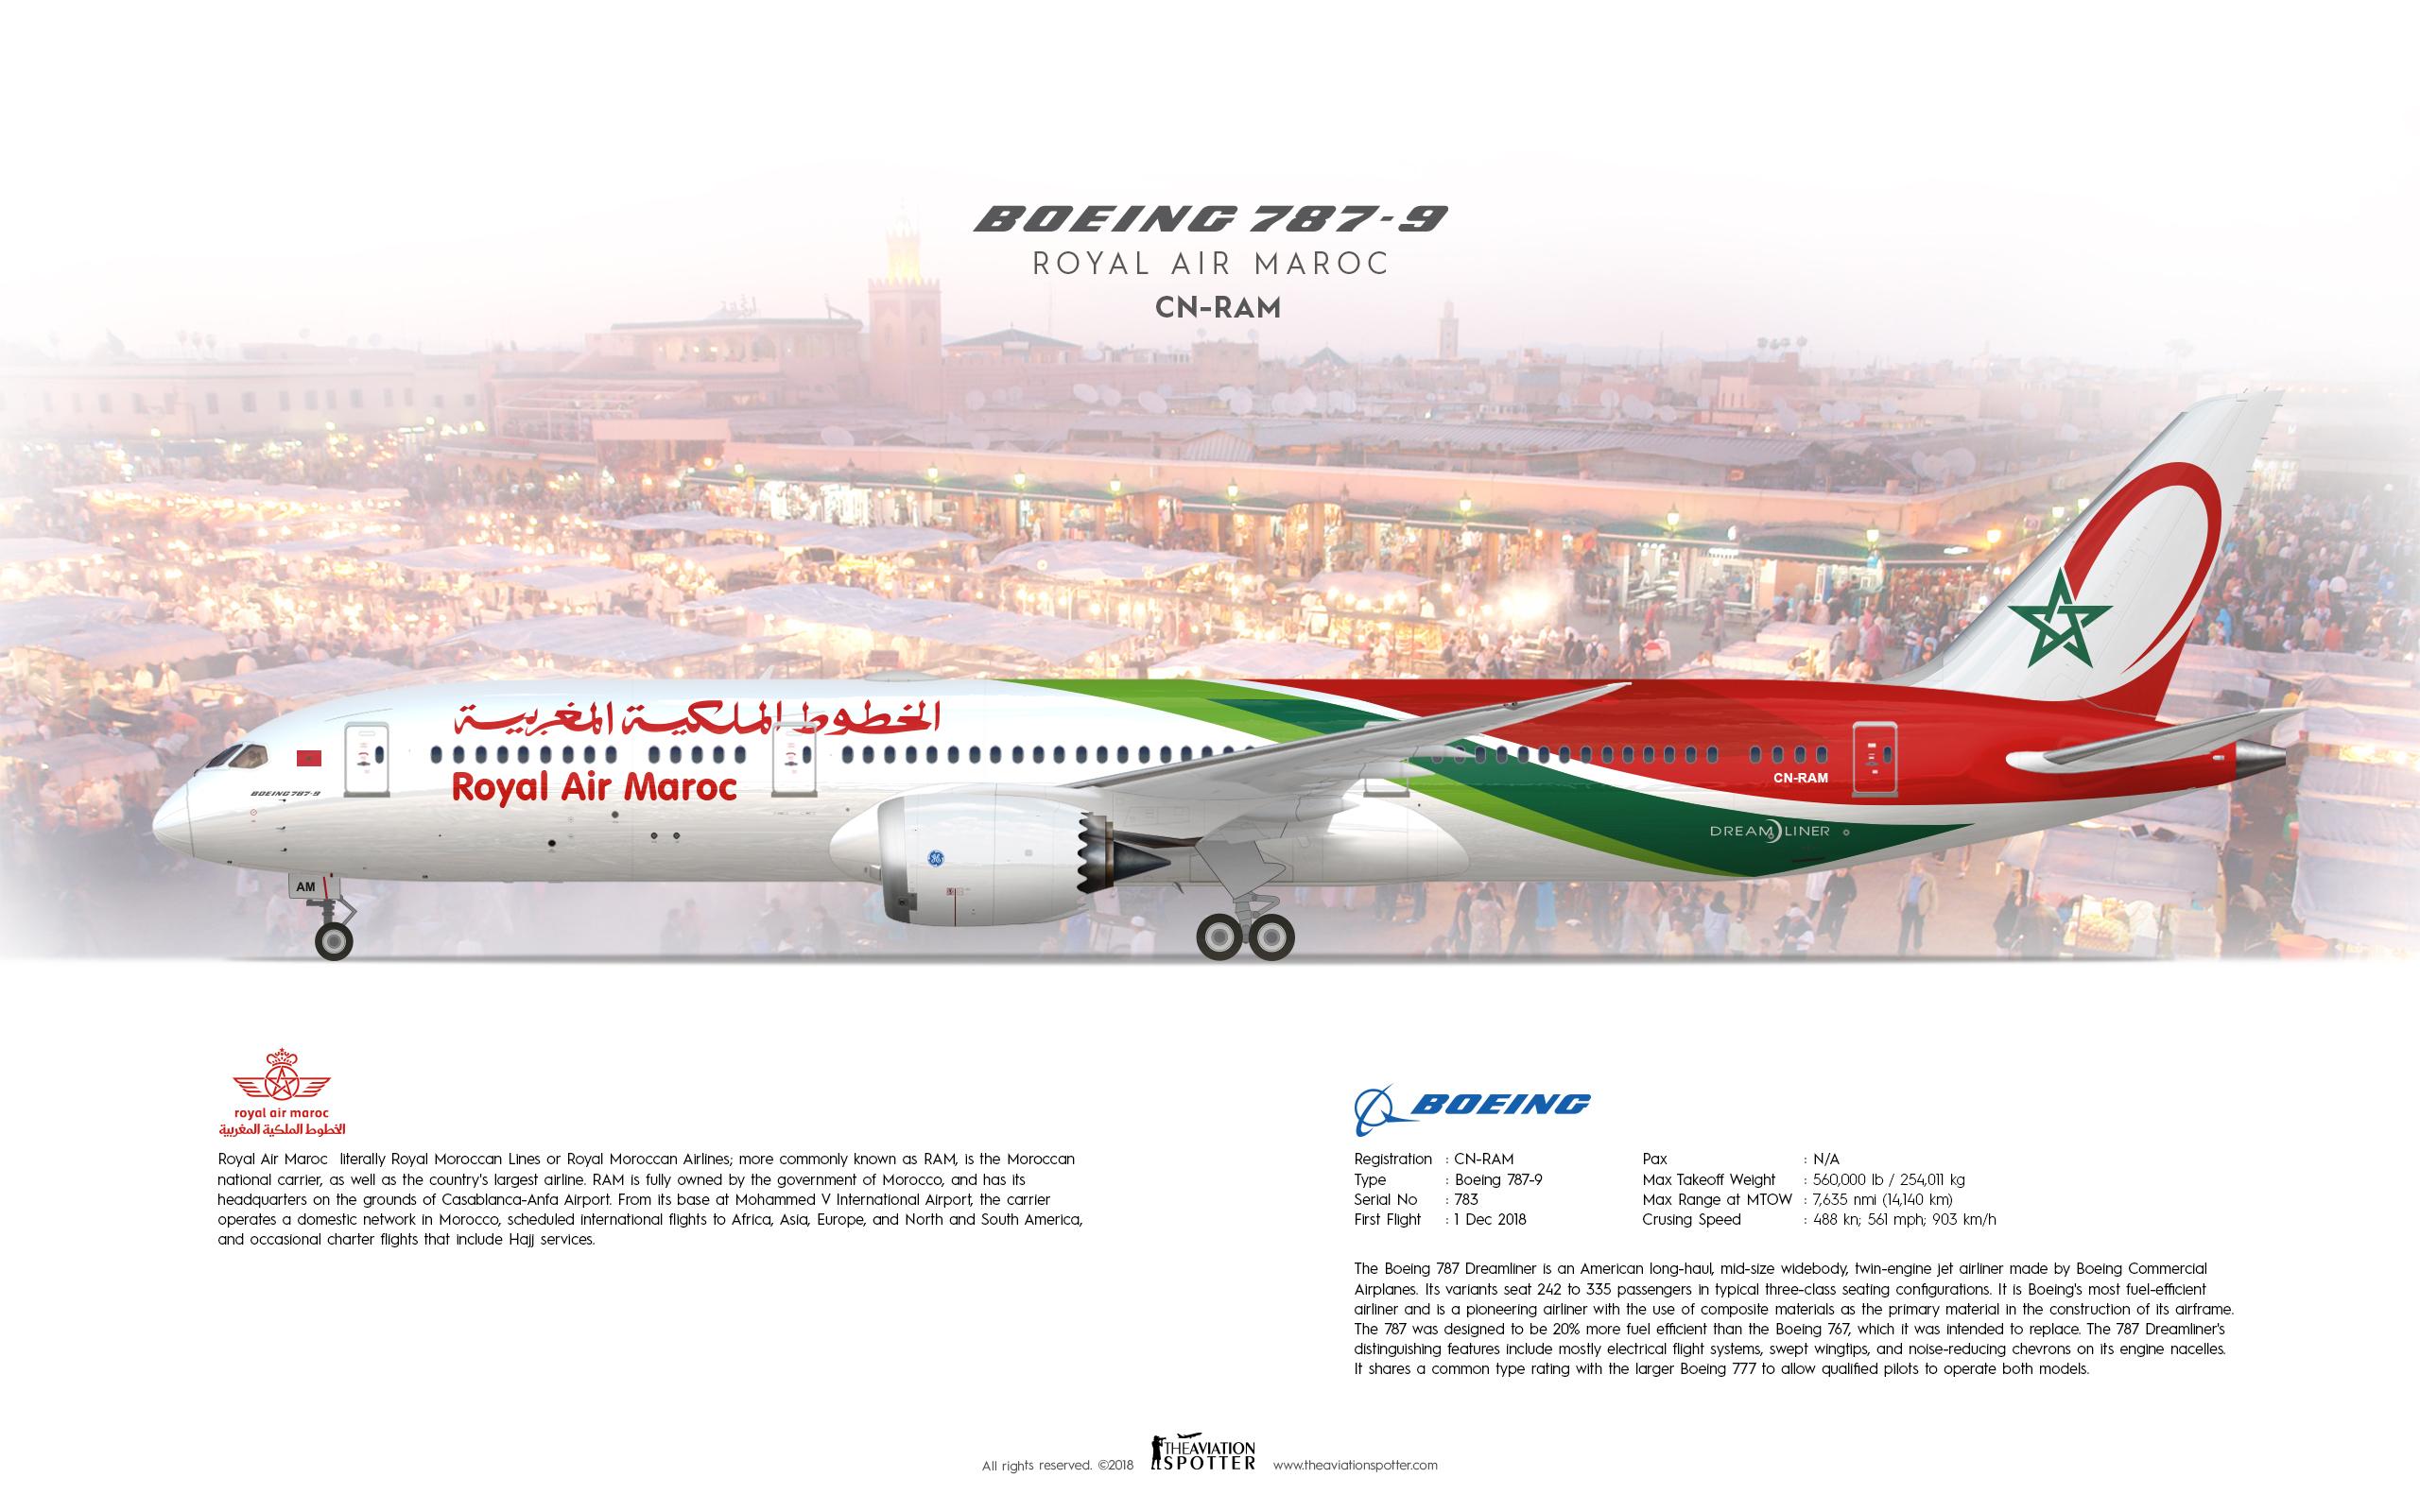 Royal Air Maroc B787 9 Dreamliner - Theaviationspotter's